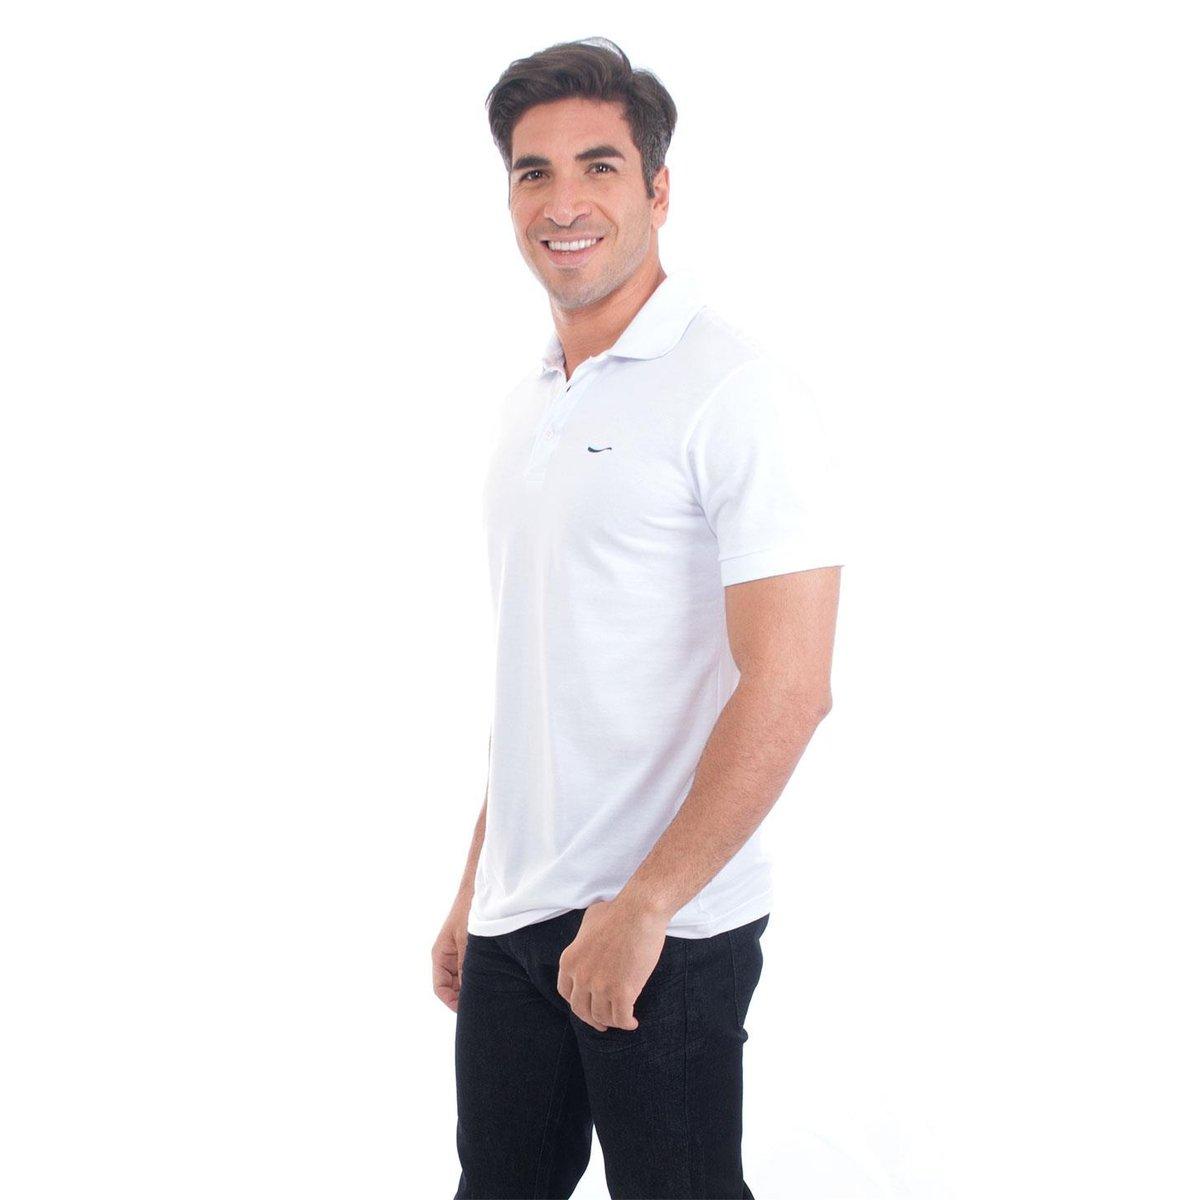 Camisa Polo Coca-Cola Jeans - Compre Agora  ac1f86eb89e83